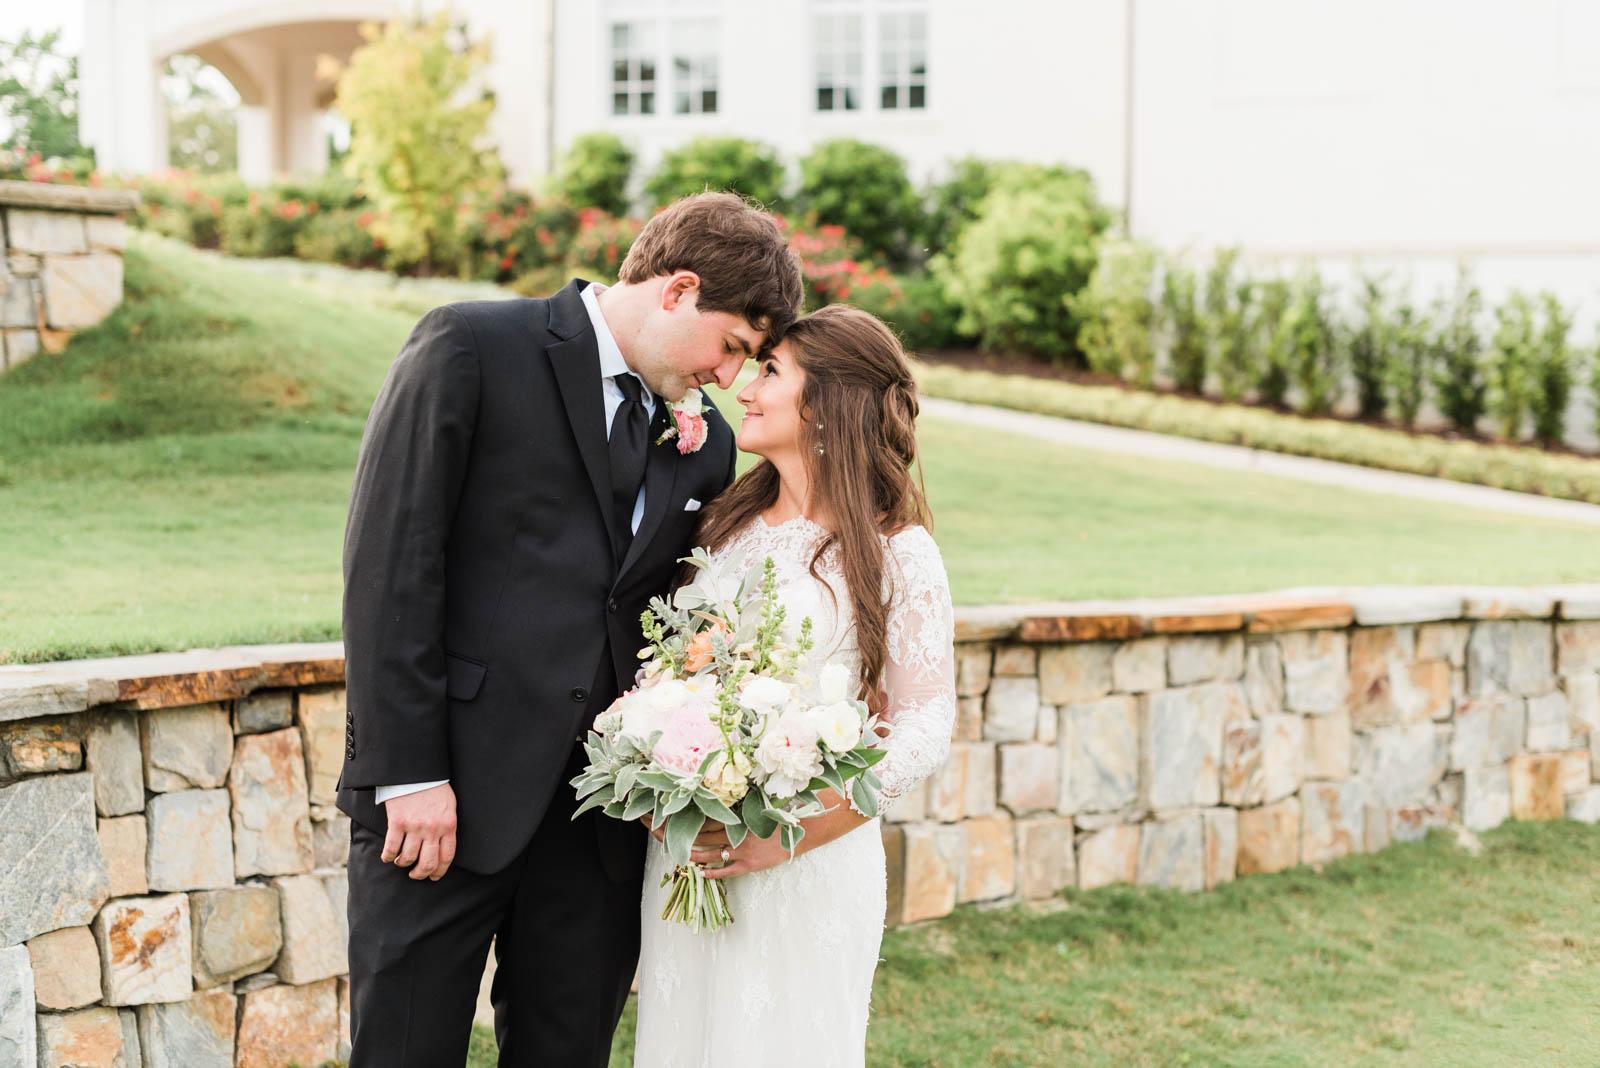 Greenville Country Club Wedding Markie Walden Photo-45.jpg